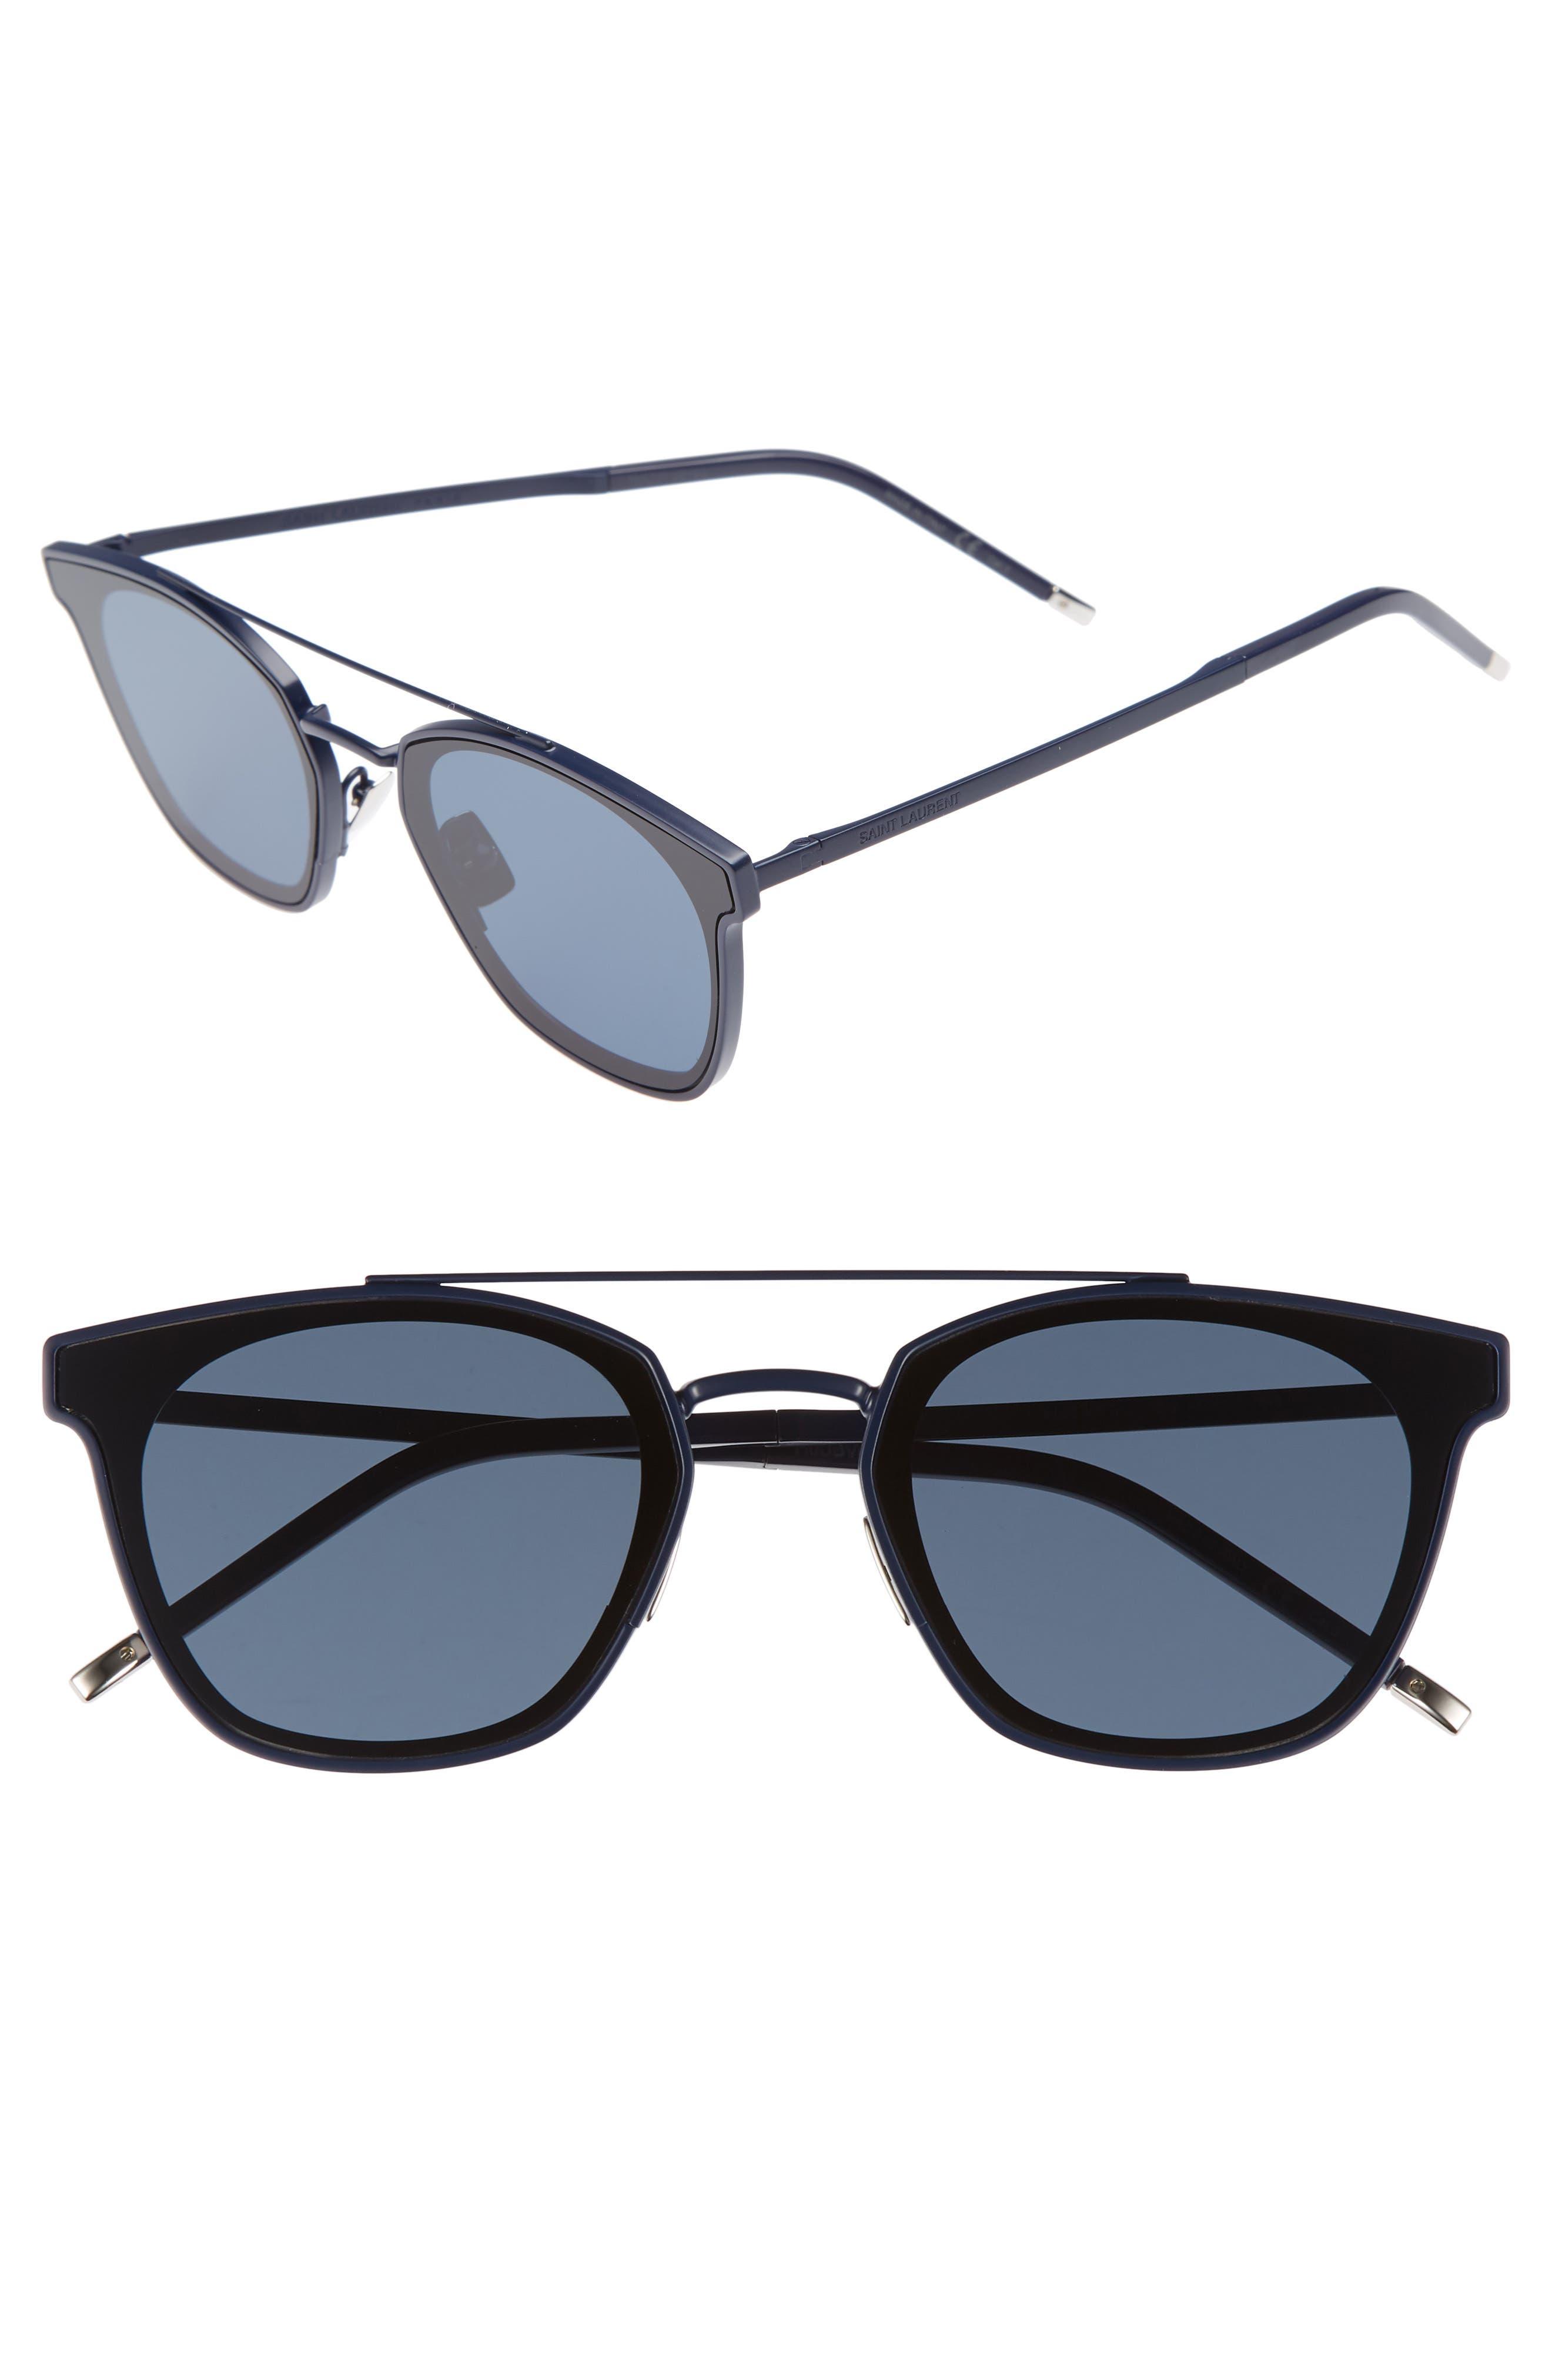 SL 28 61mm Polarized Sunglasses,                         Main,                         color, BLUE